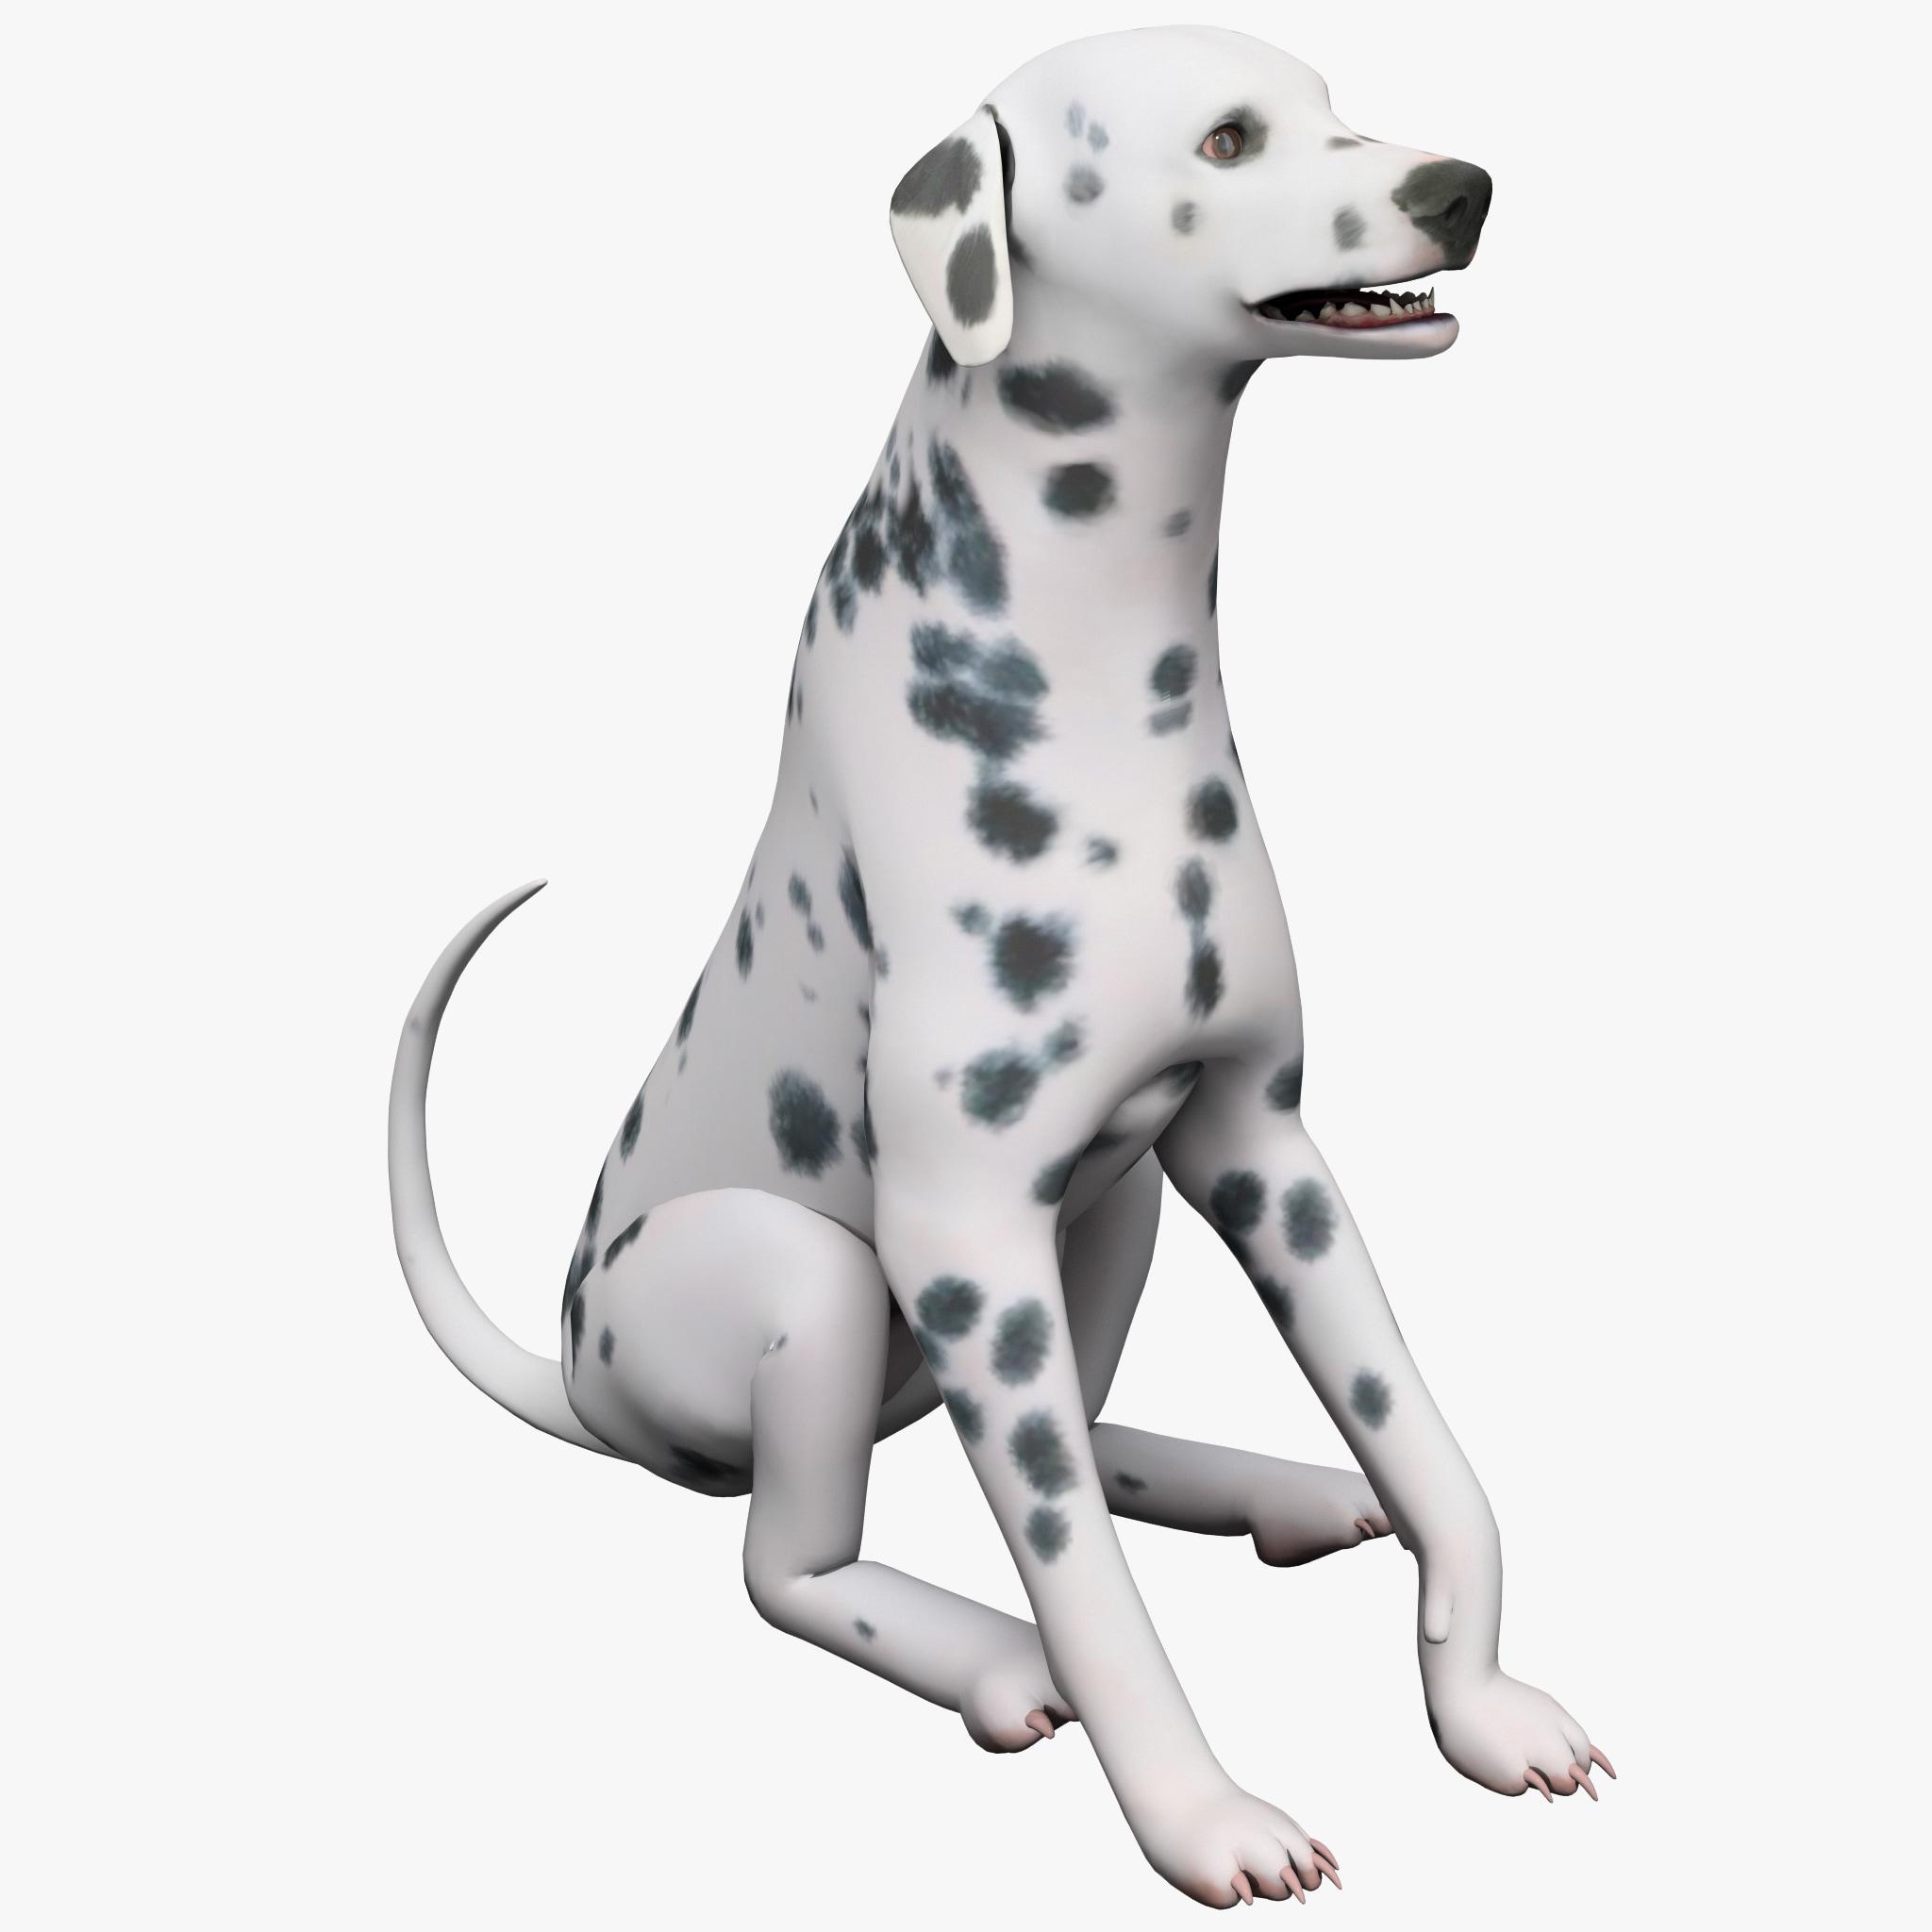 dsmax dalmatian dog pose